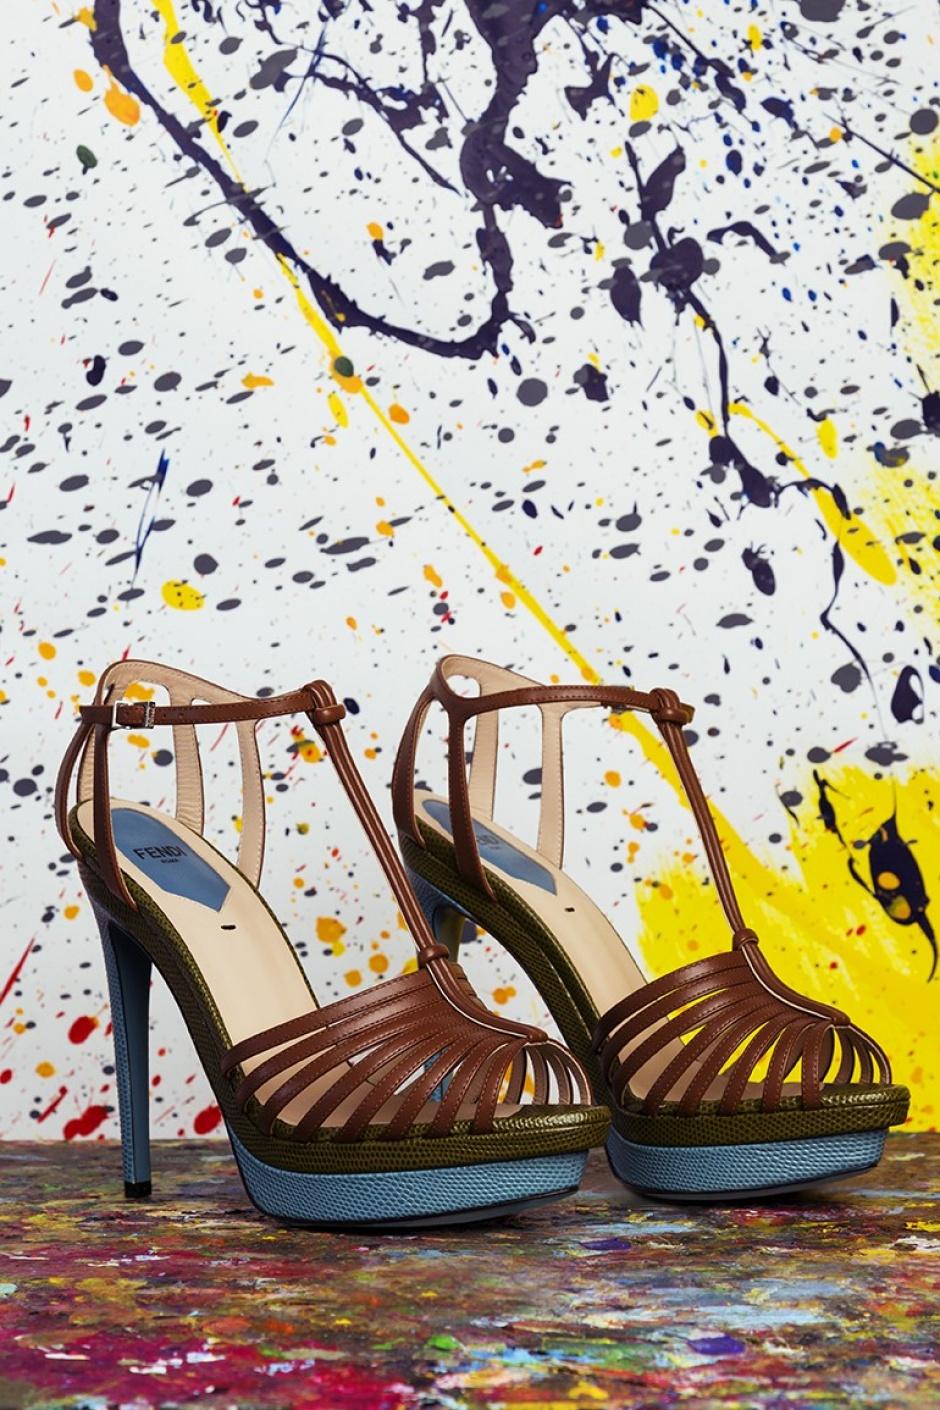 Fendi shoes shoot x SavoirFlair